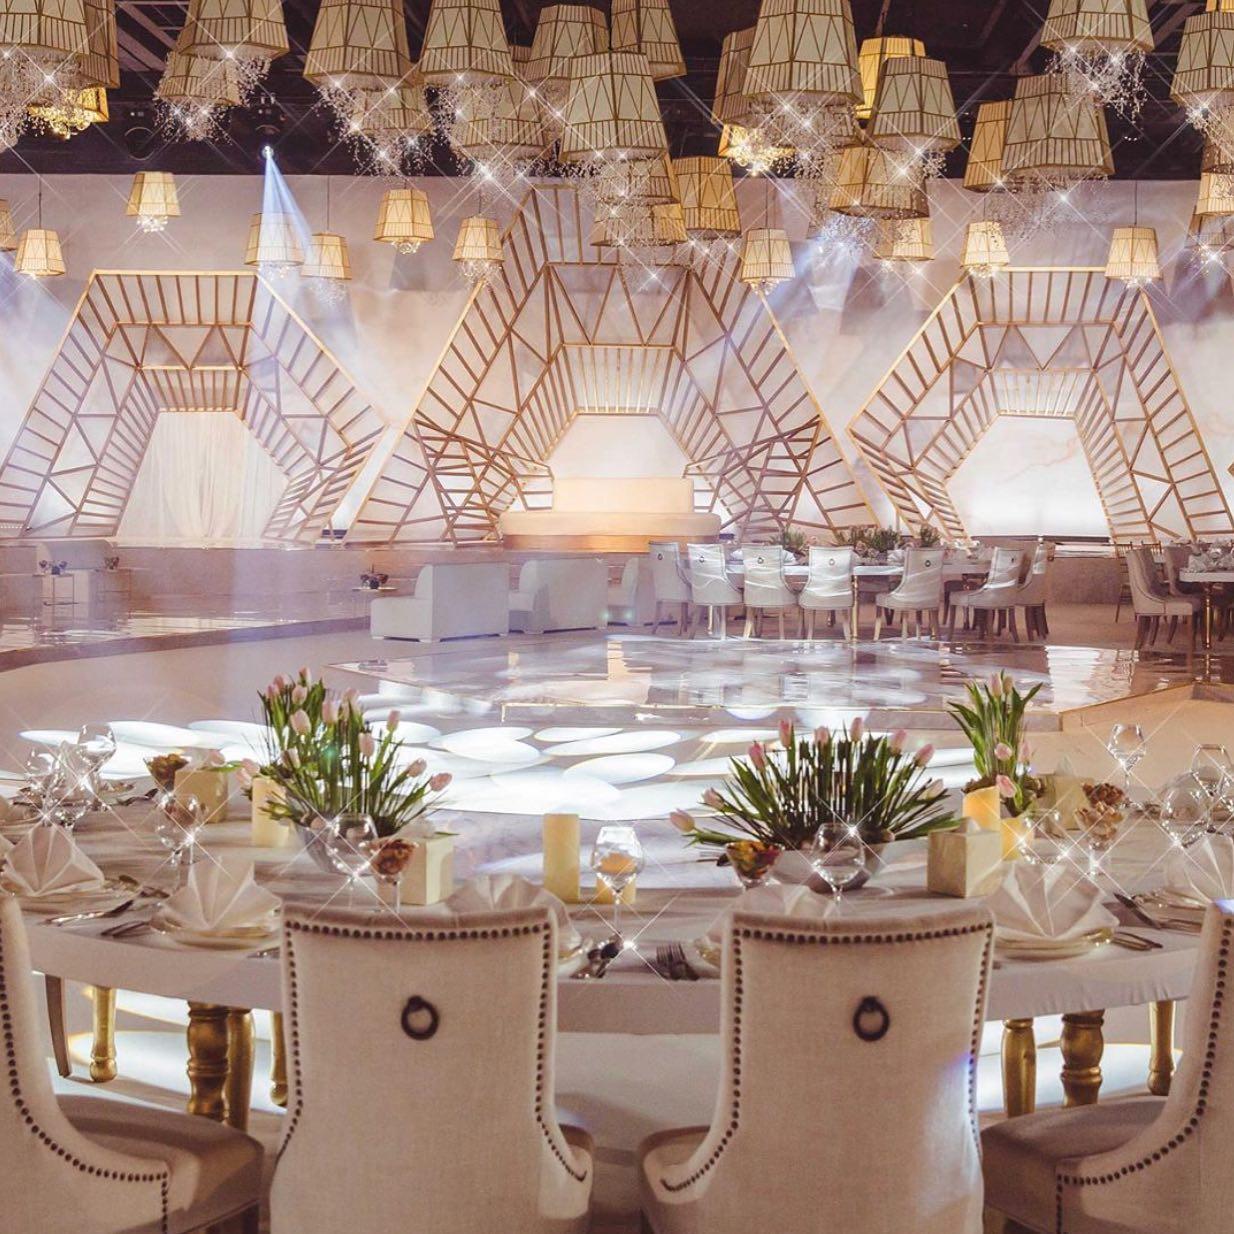 Olivier Dolz wedding planner Dubai - Wedding Hub - 07